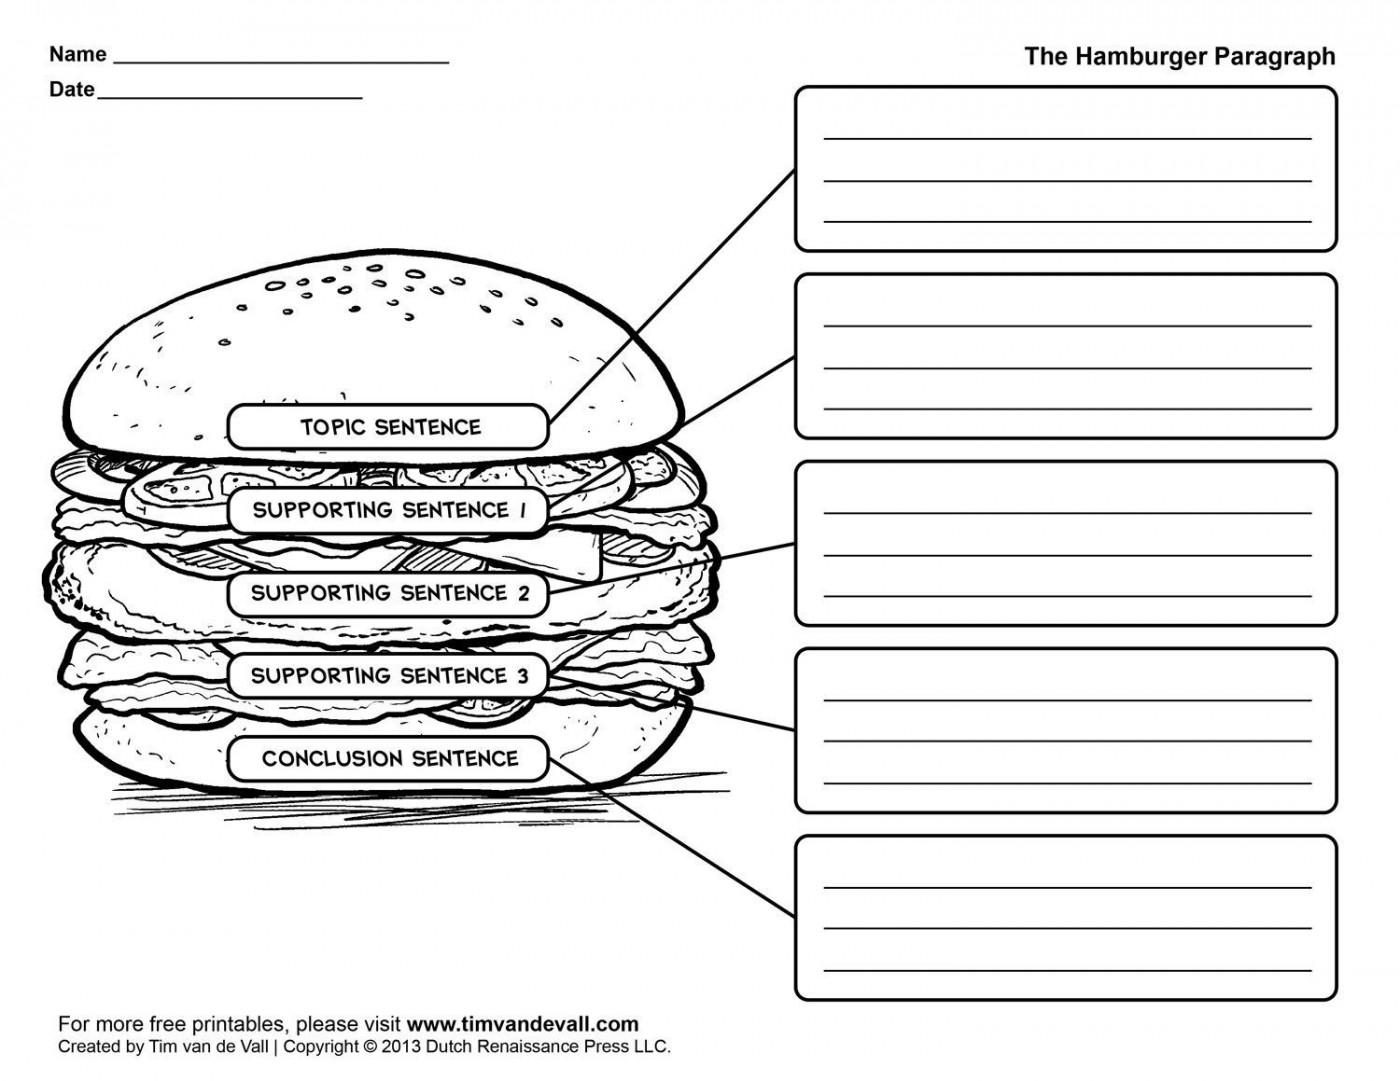 009 Essay Example Five Paragraph Graphic Wonderful Organizer High School Definition 5 Pdf 1400